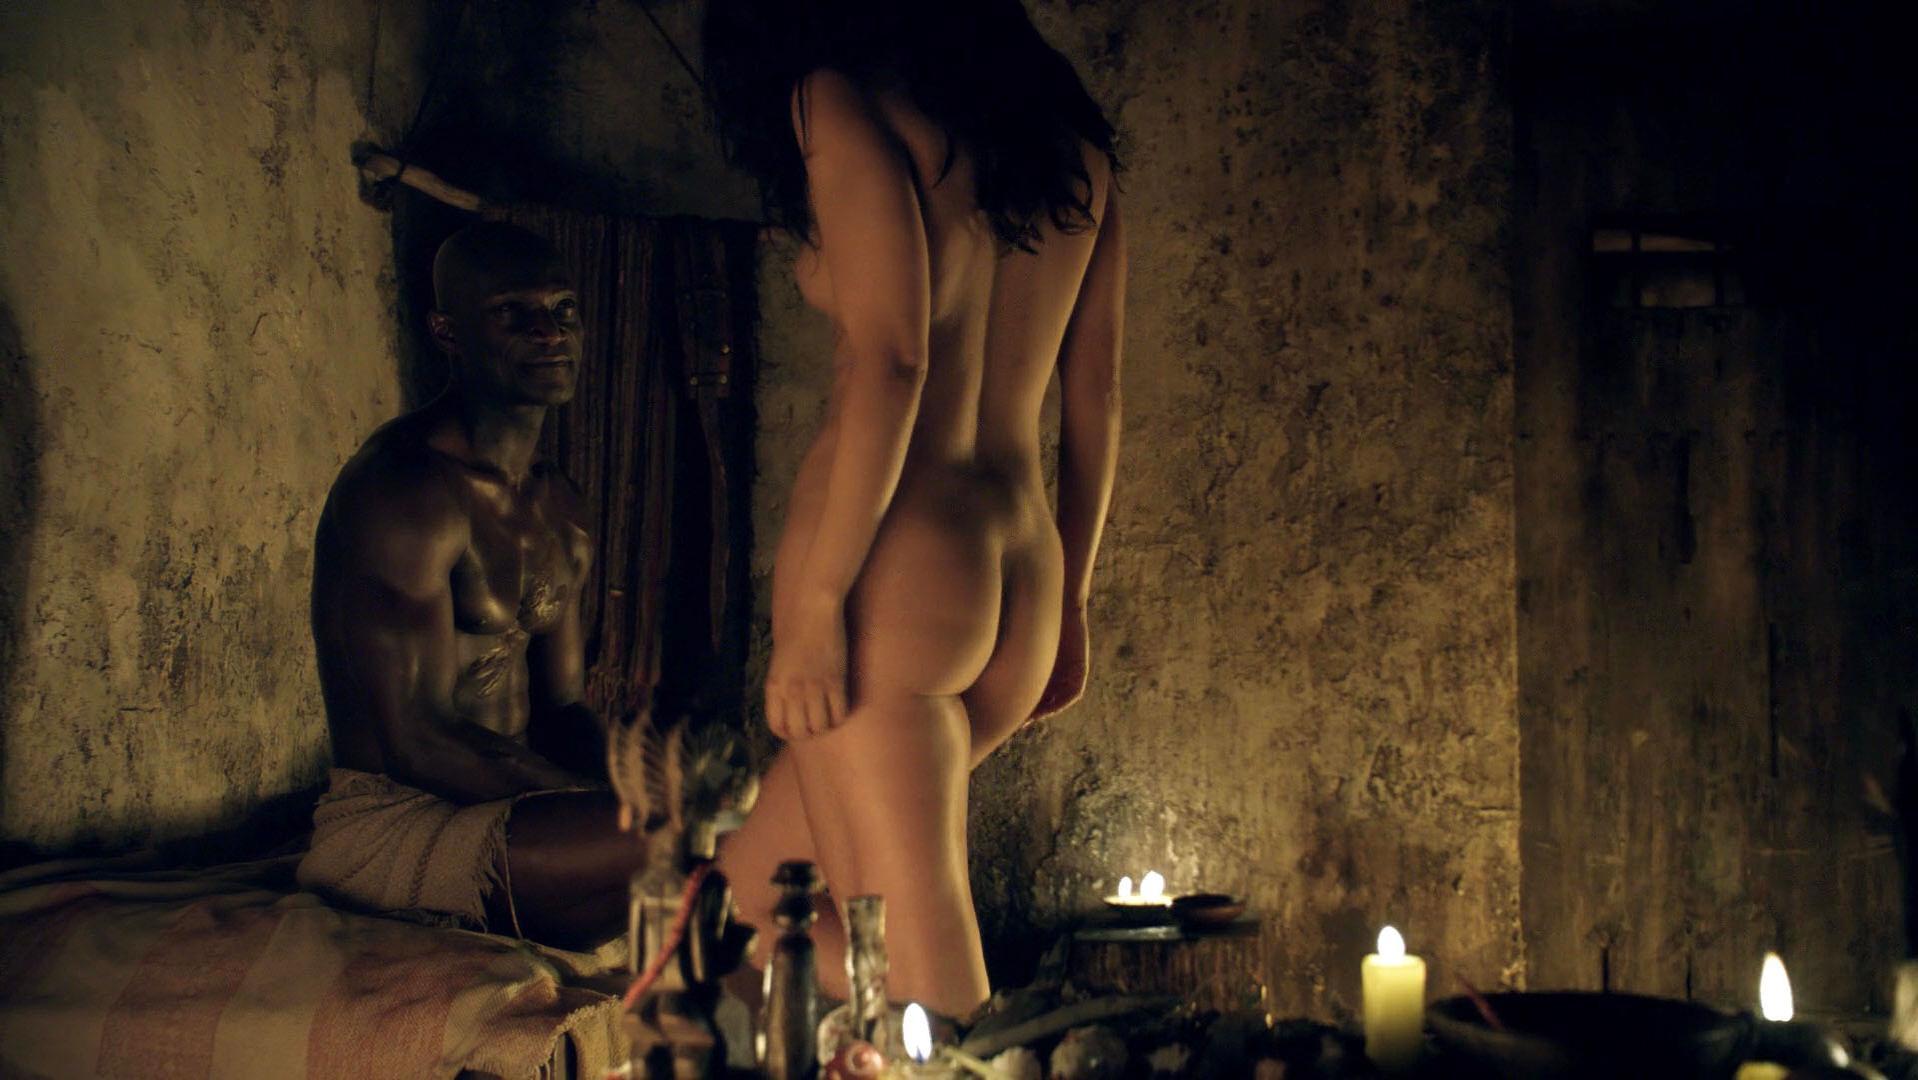 Marisa Ramirez nude - Spartacus. Gods of the Arena s01e01 (2011)